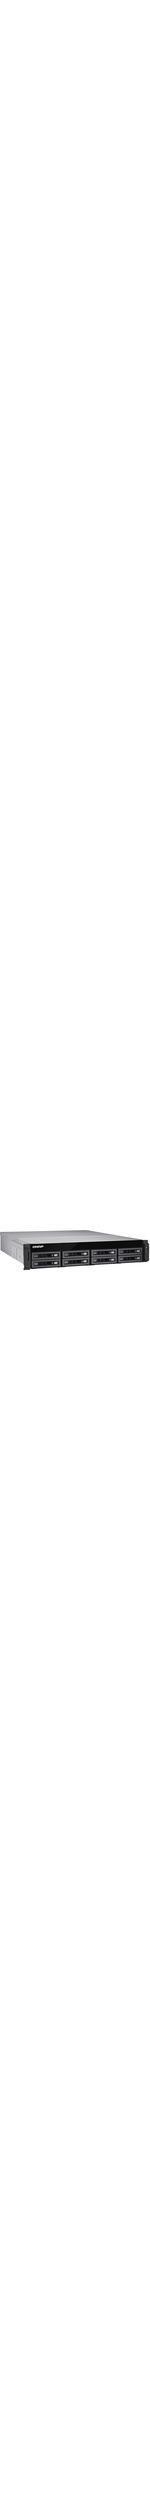 QNAP Turbo NAS TS-EC880U-E3-4GE-R2 8 x Total Bays SAN/NAS Server - 2U - Rack-mountable